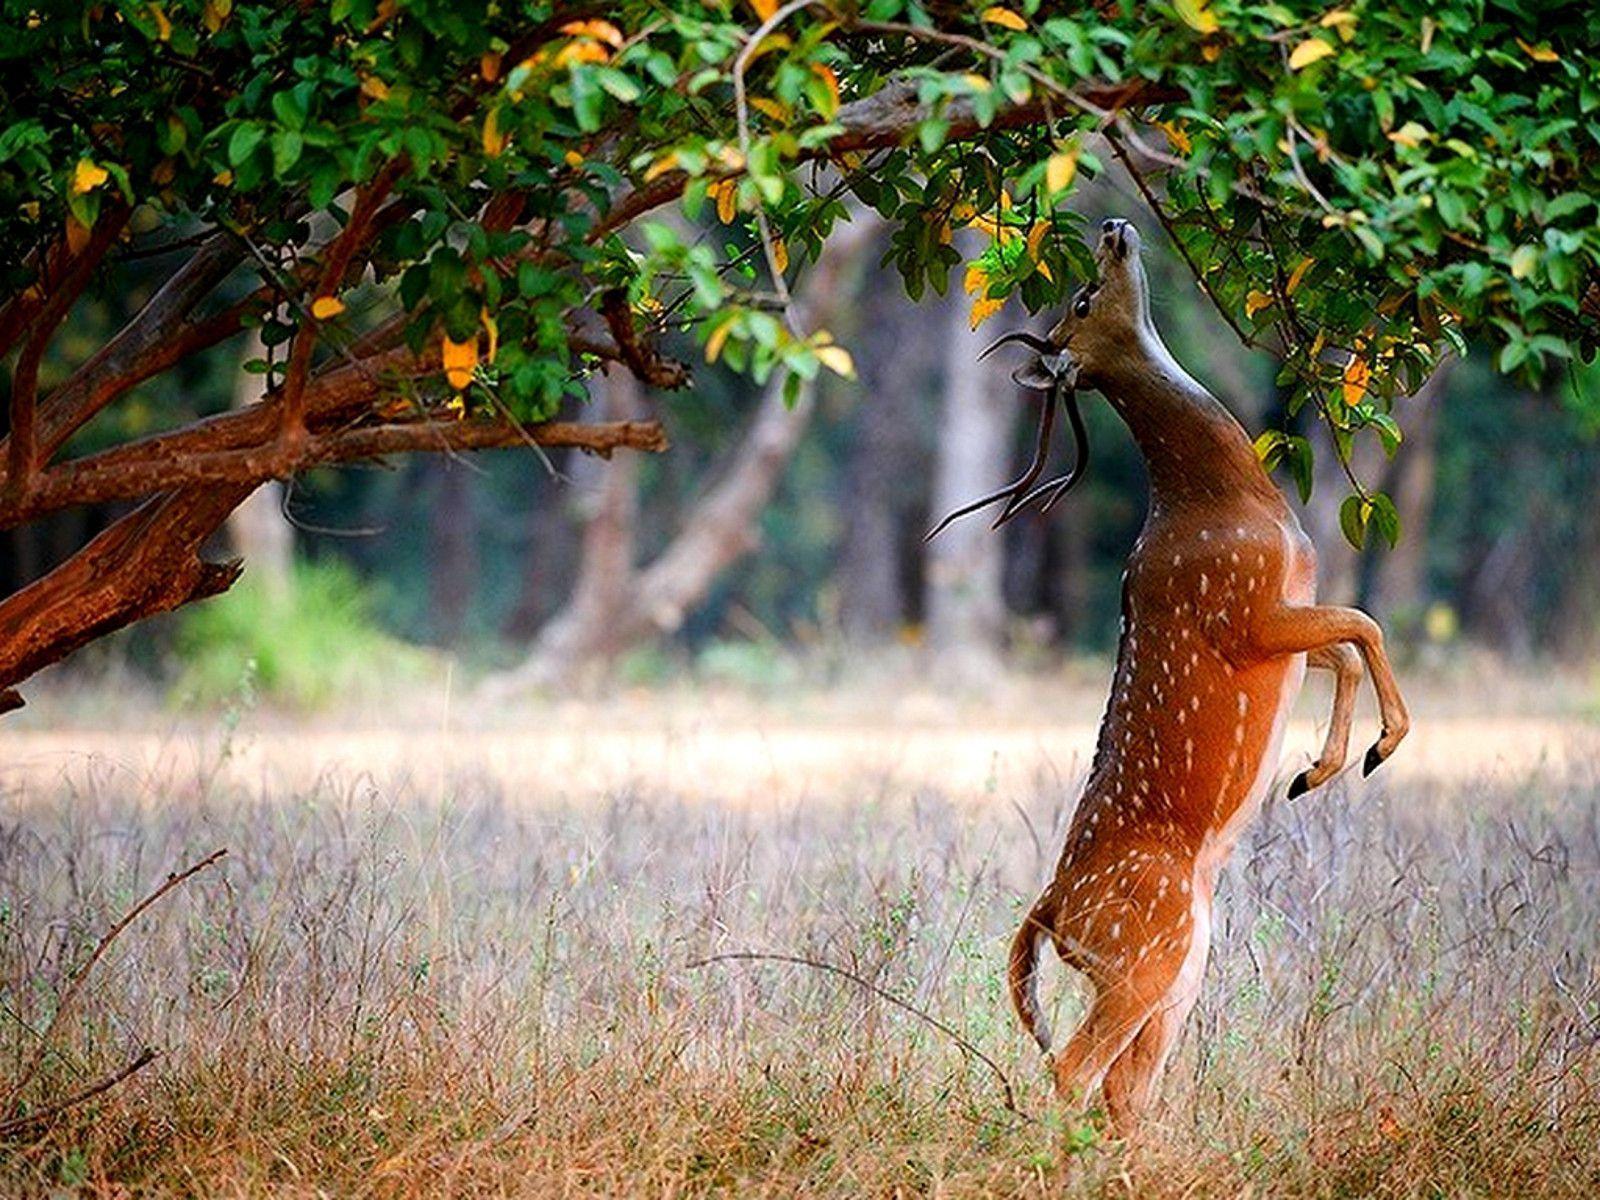 Cool Hunting Wallpapers HD Deer For Desktop Backgrounds